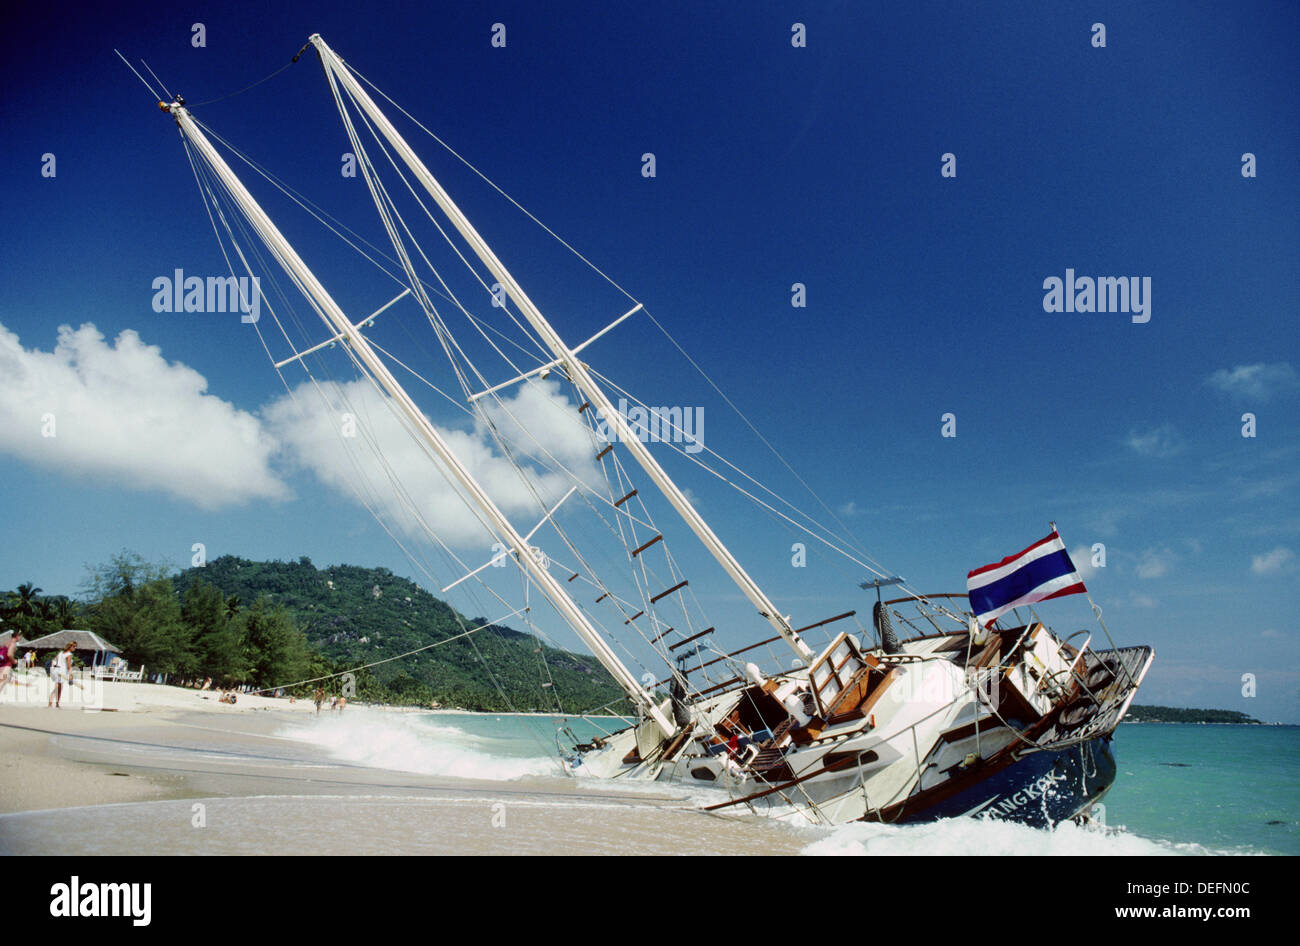 Sailboat Wrecked Stock Photos & Sailboat Wrecked Stock ...